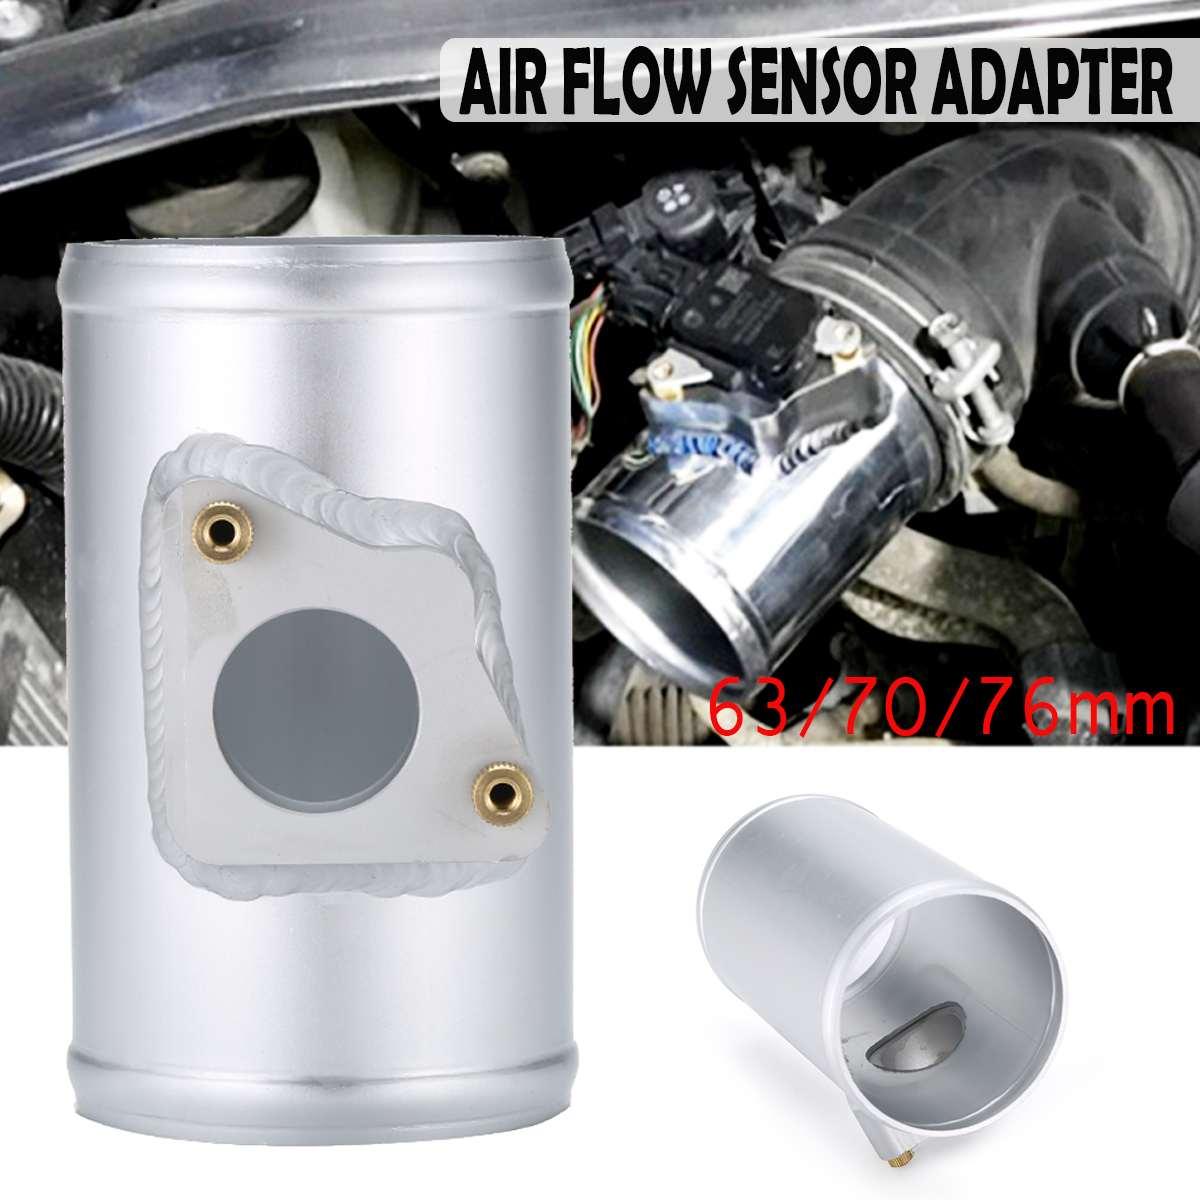 Air Flow Sensor Adapter Performance Air Intake Meter Mount 63 70 76mm for TOYOTA for MAZDA 3 6 for SUBARU SUZUKI SWIFT JIMNY MAF